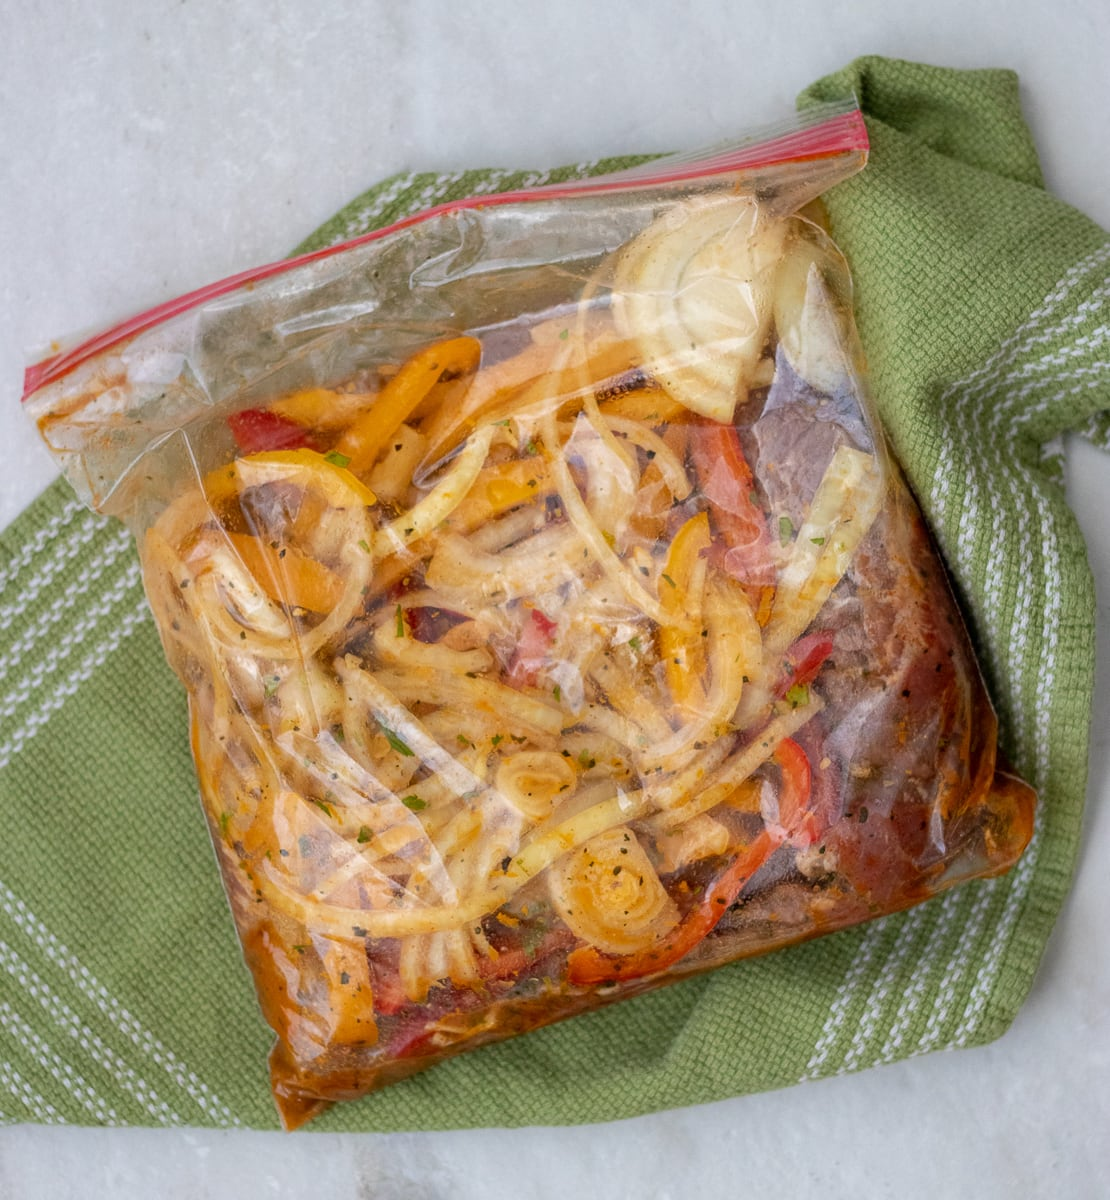 Citrus marinade for flank steak fajitas and veggies.